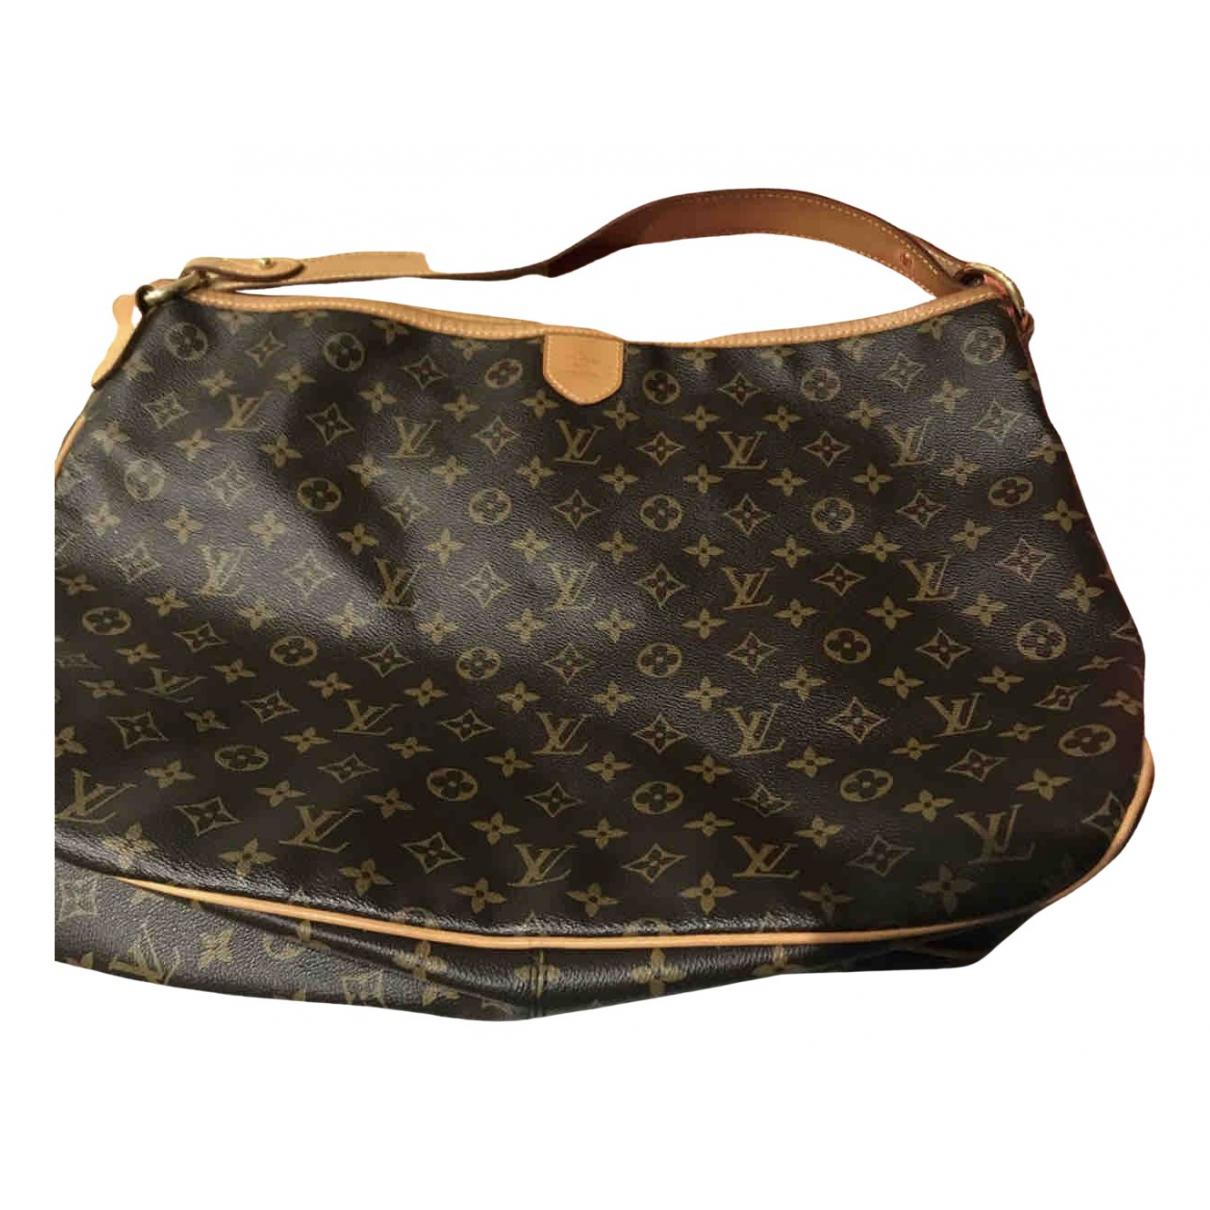 Louis Vuitton Delightful Brown Cloth handbag for Women N